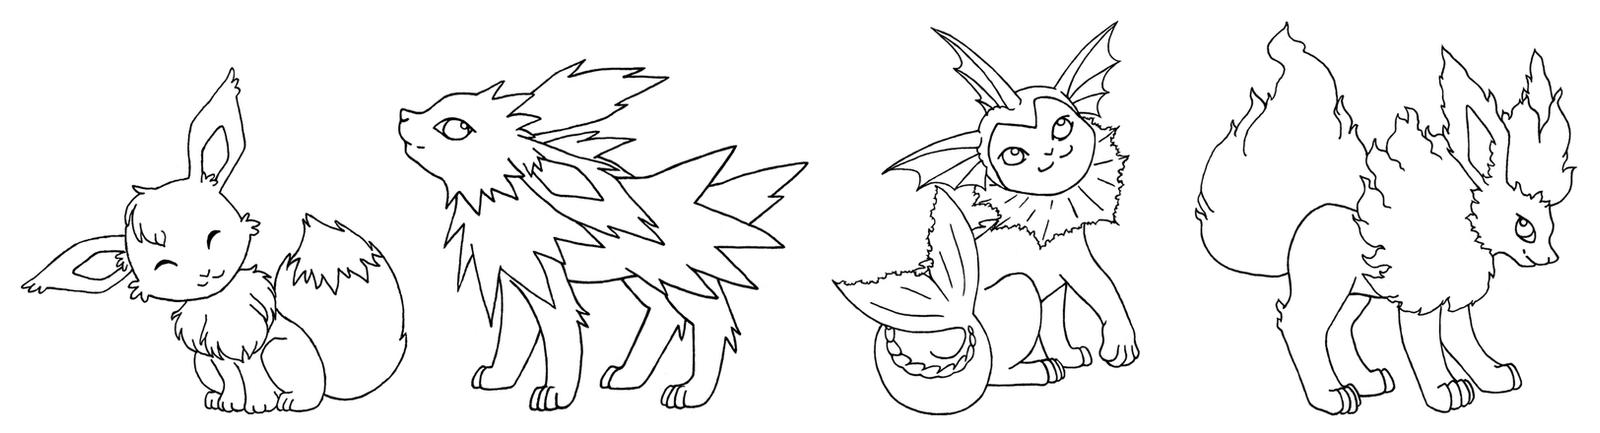 Pokemon eevee basic evols by imaginaryfox on deviantart for Pokemon eevee evolutions coloring pages